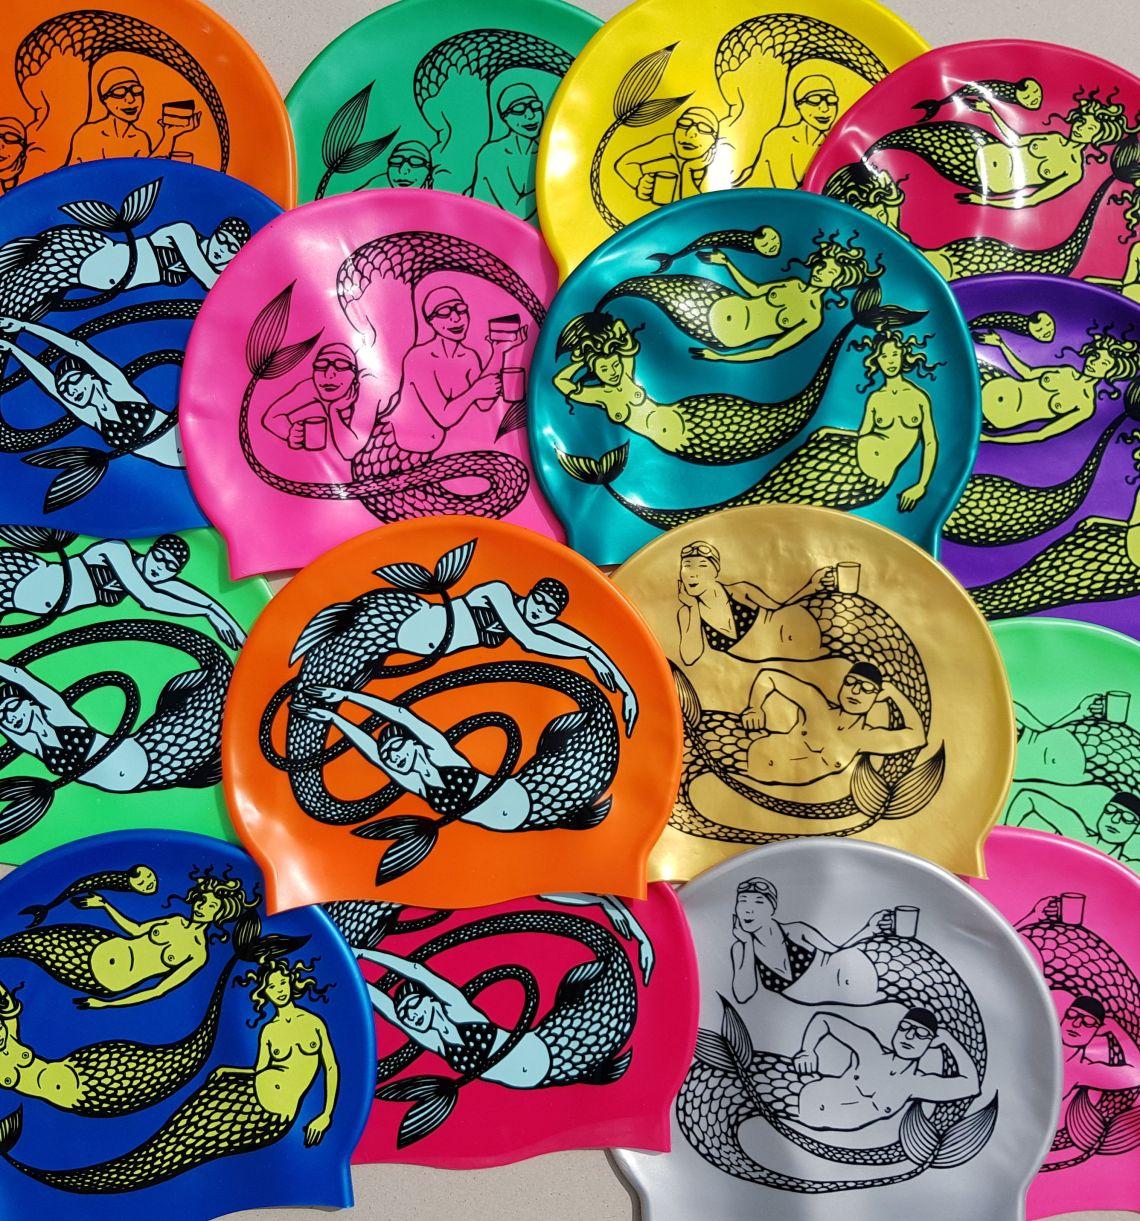 Mermaid Swimming hats designed by Nancy Farmer